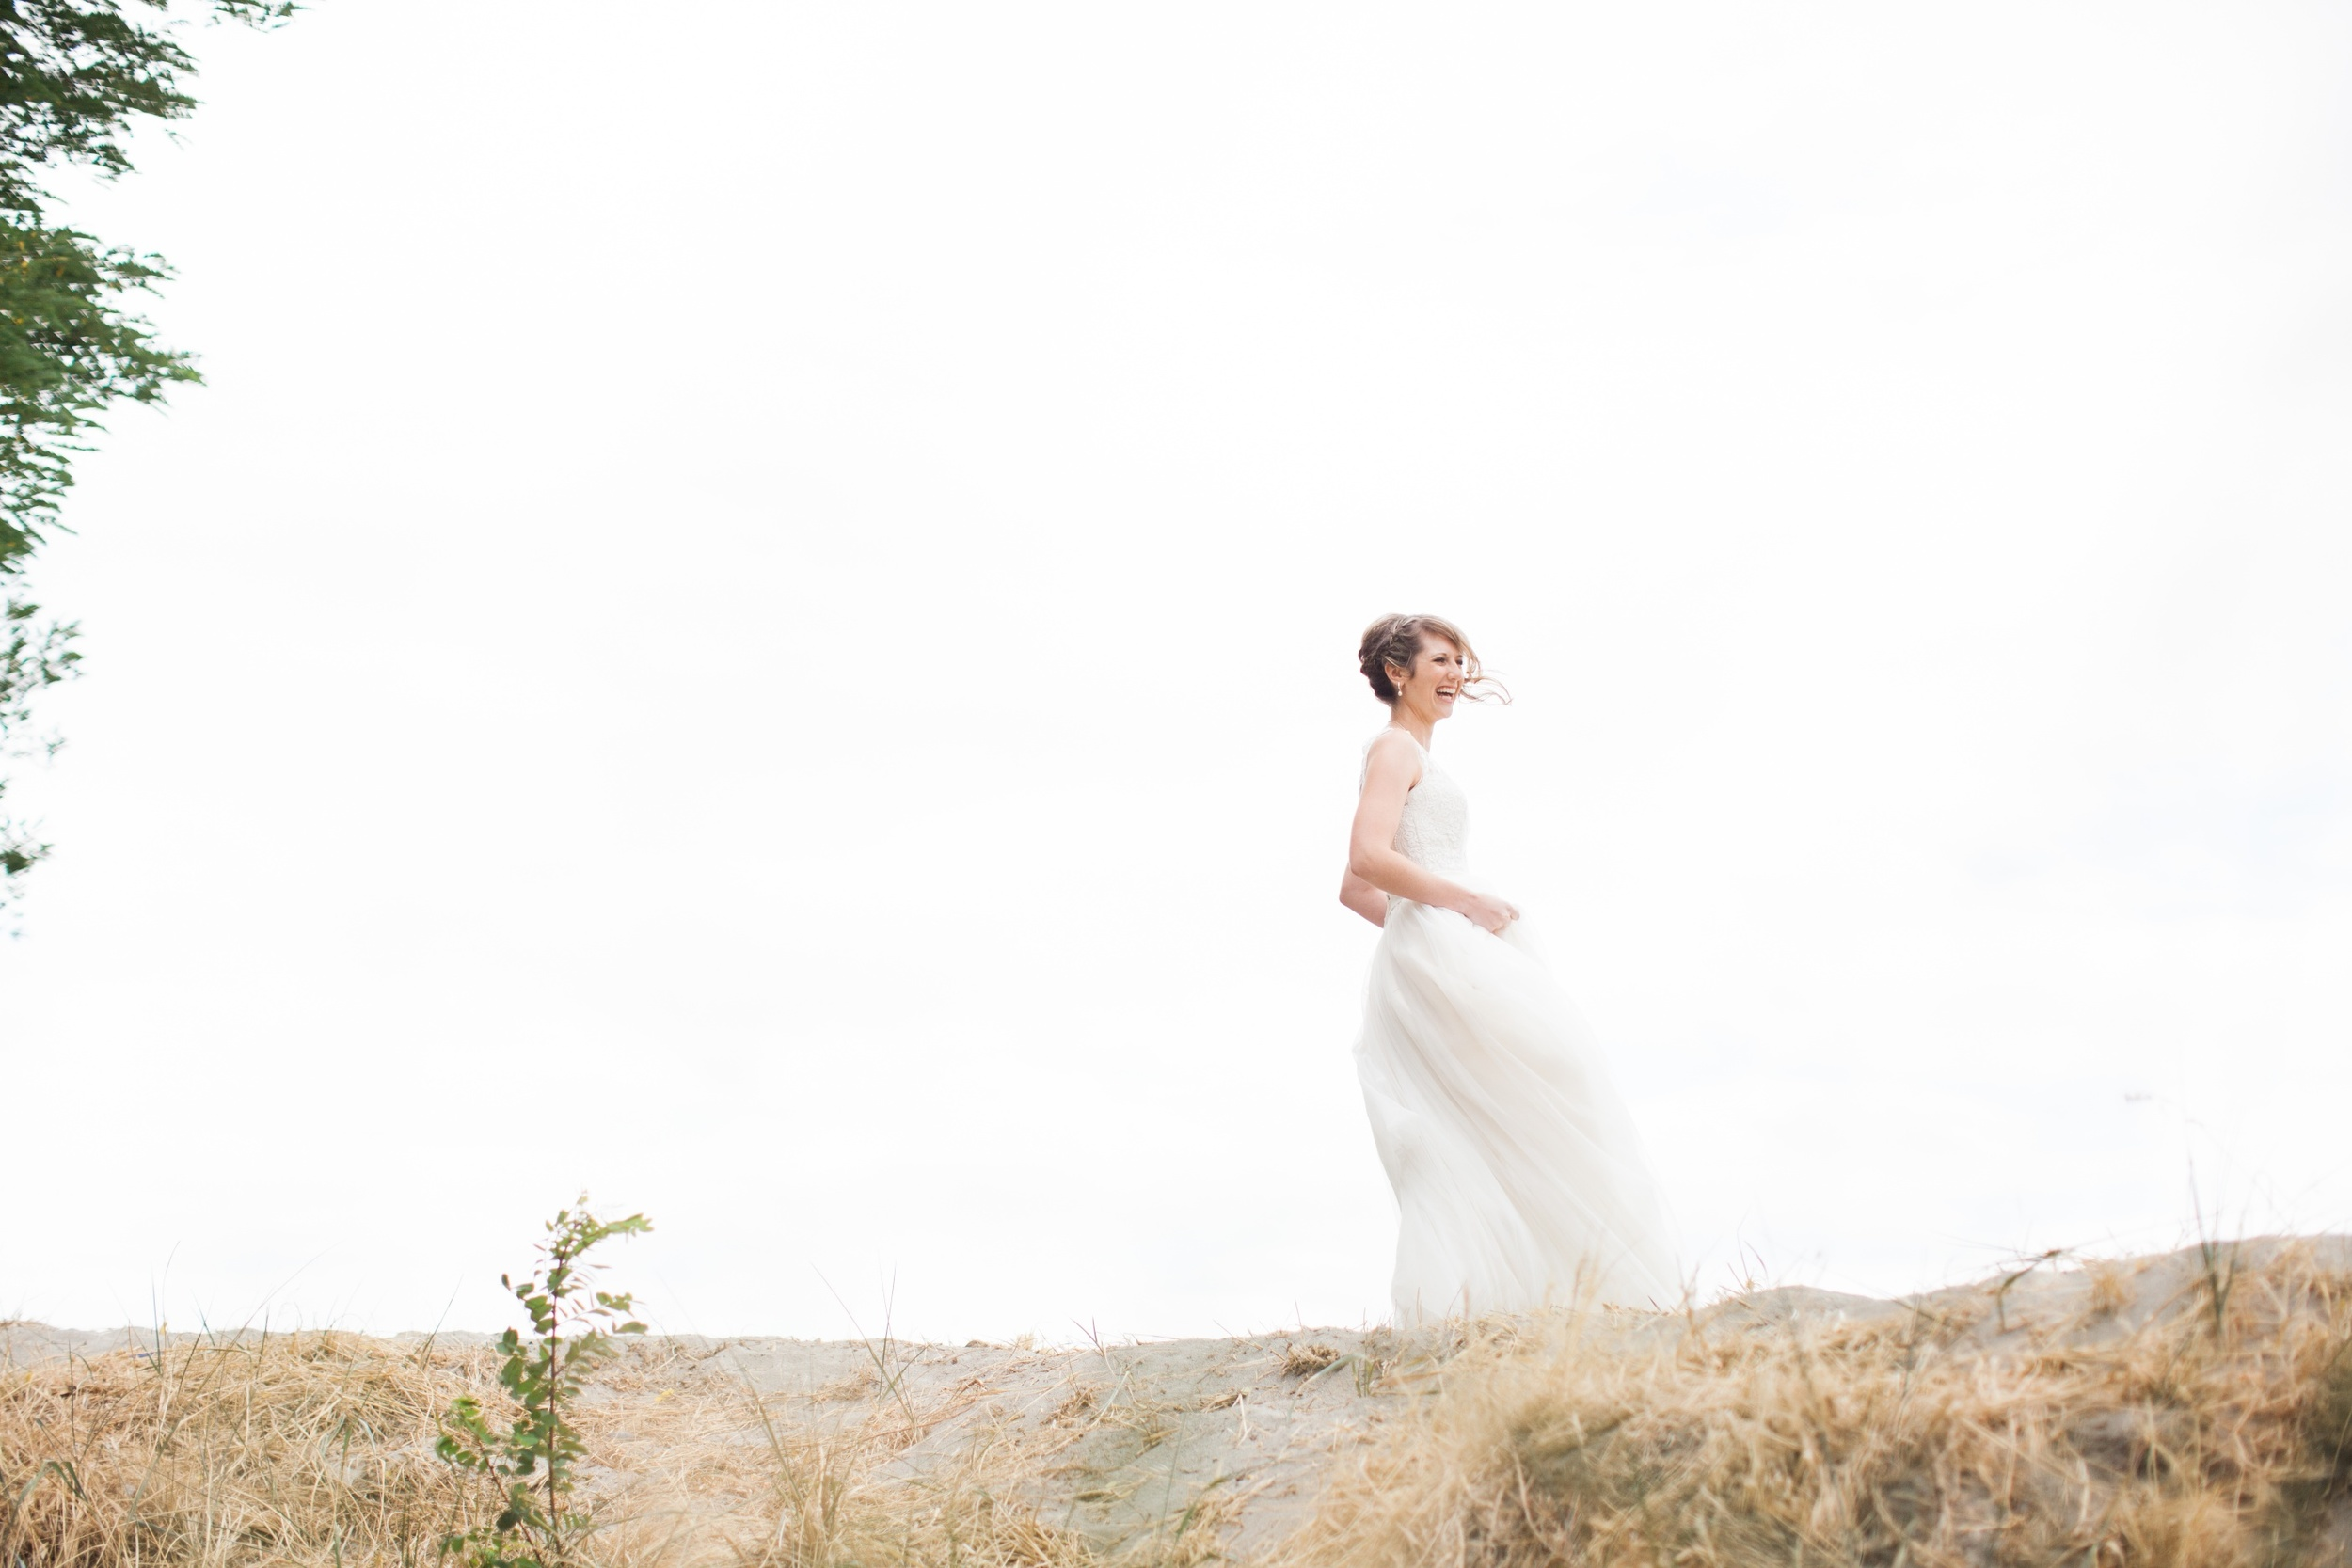 seattle wedding photographer film photography golden garden gardens state park ocean sand bride groom 16.jpg